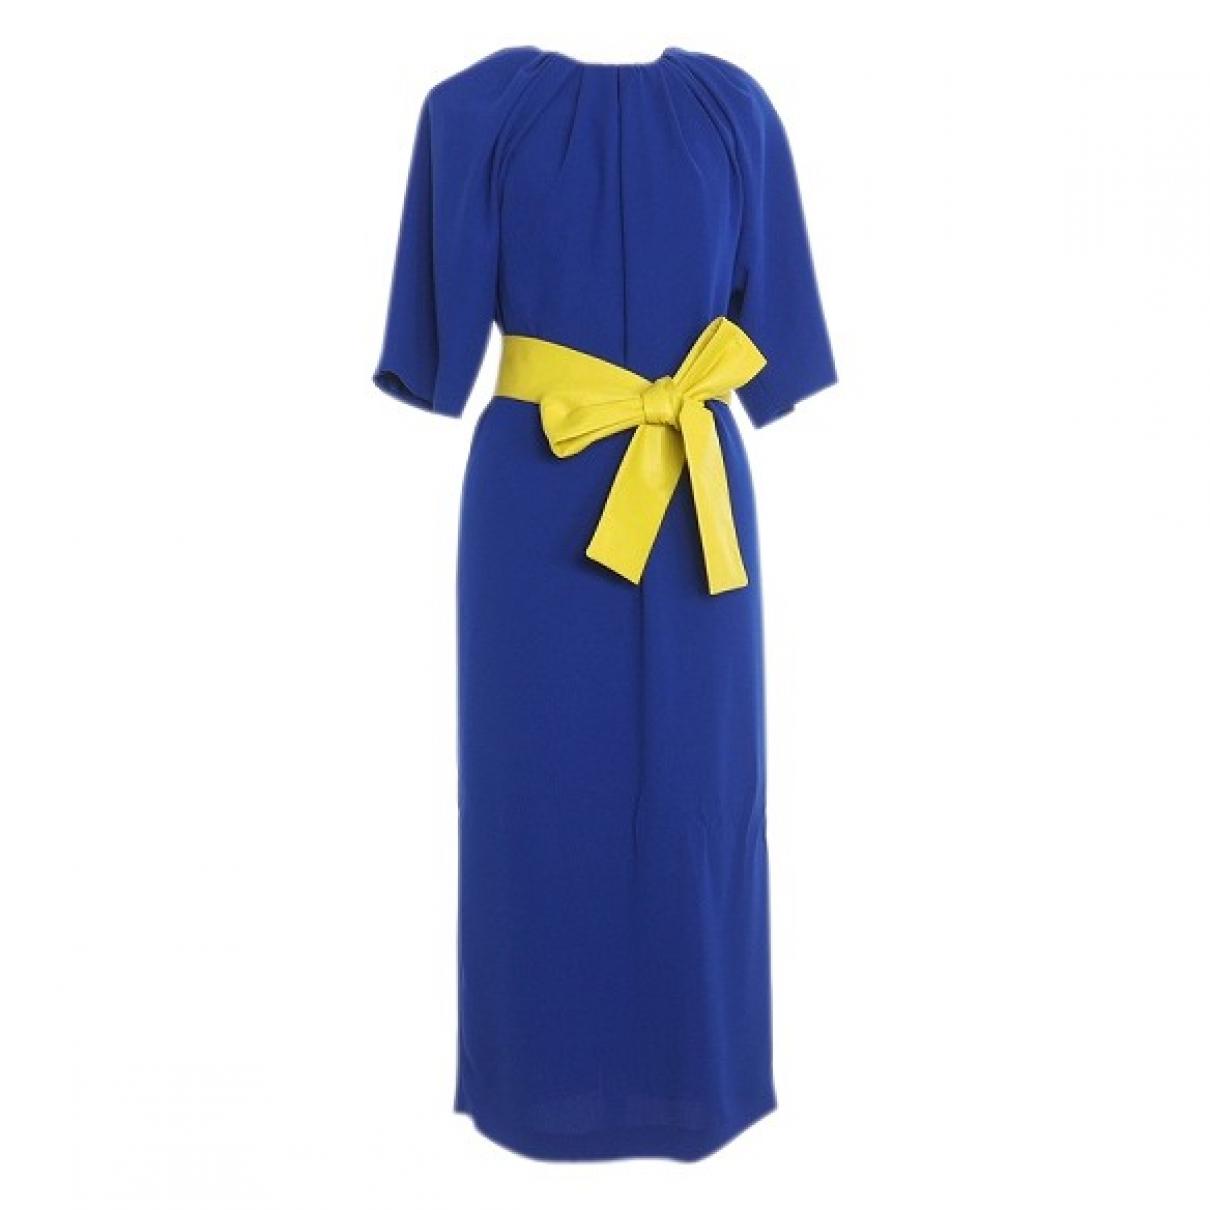 Maison Martin Margiela \N Cotton dress for Women 38 FR